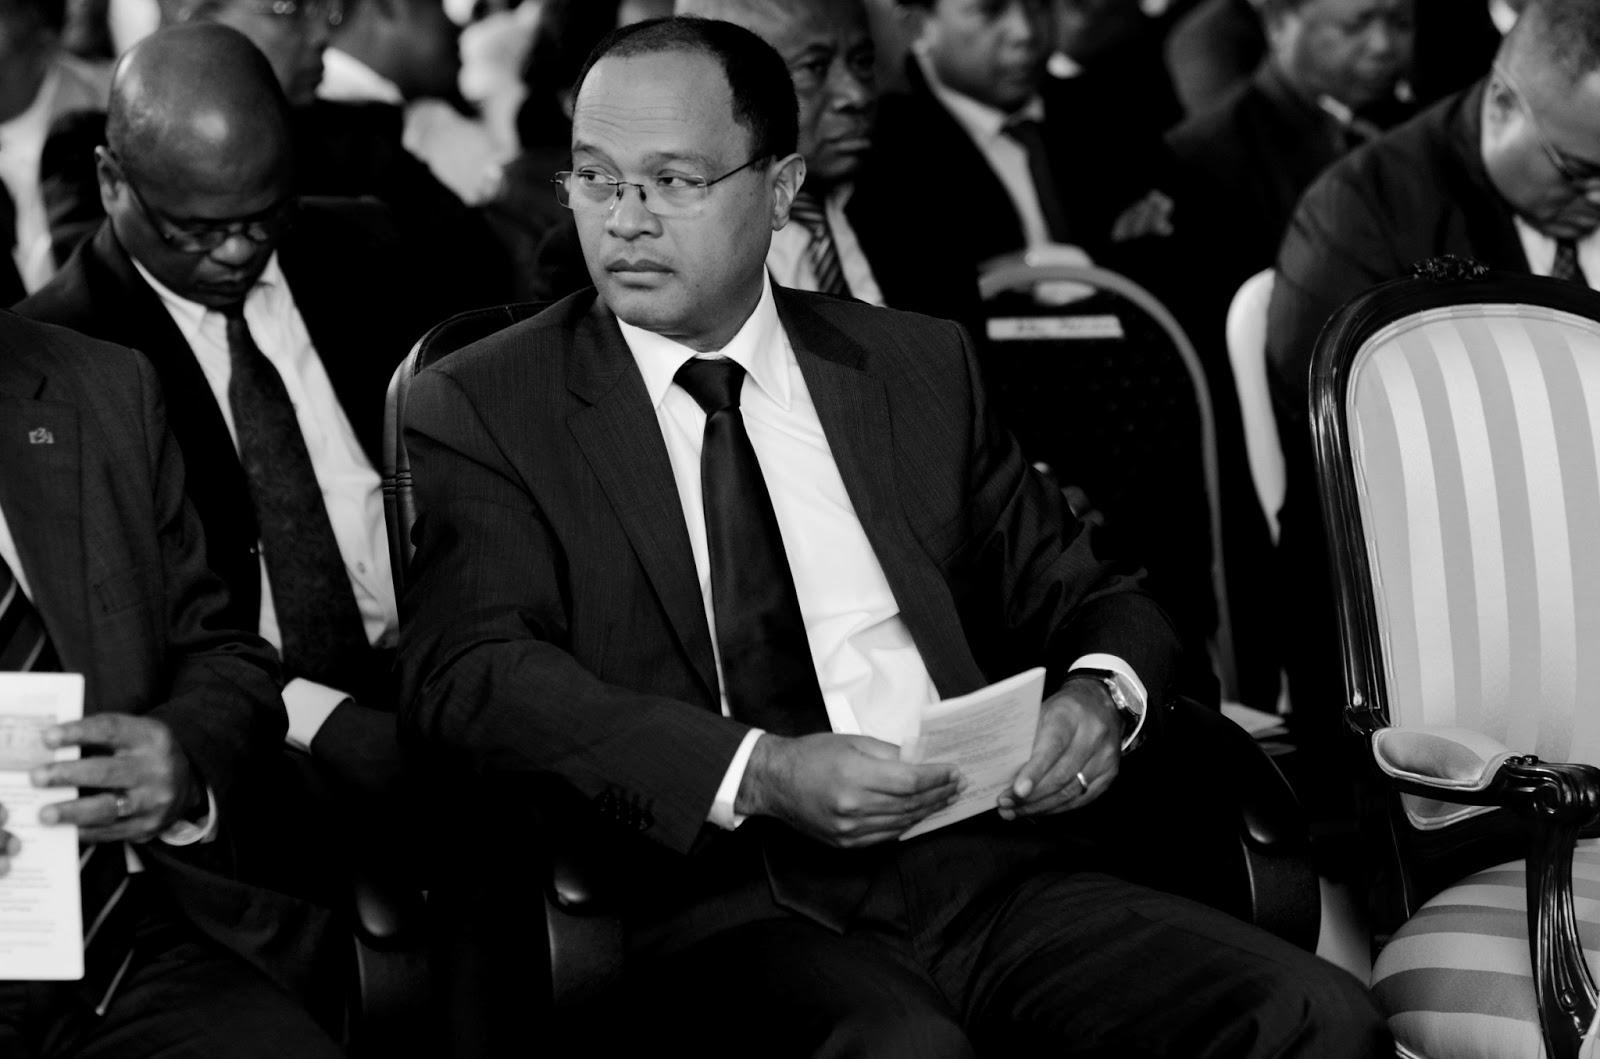 wHO's who? l'élection présidentielle à Madagascar en 18 photos  MADA+EDGARD+RAZAF+2+NB